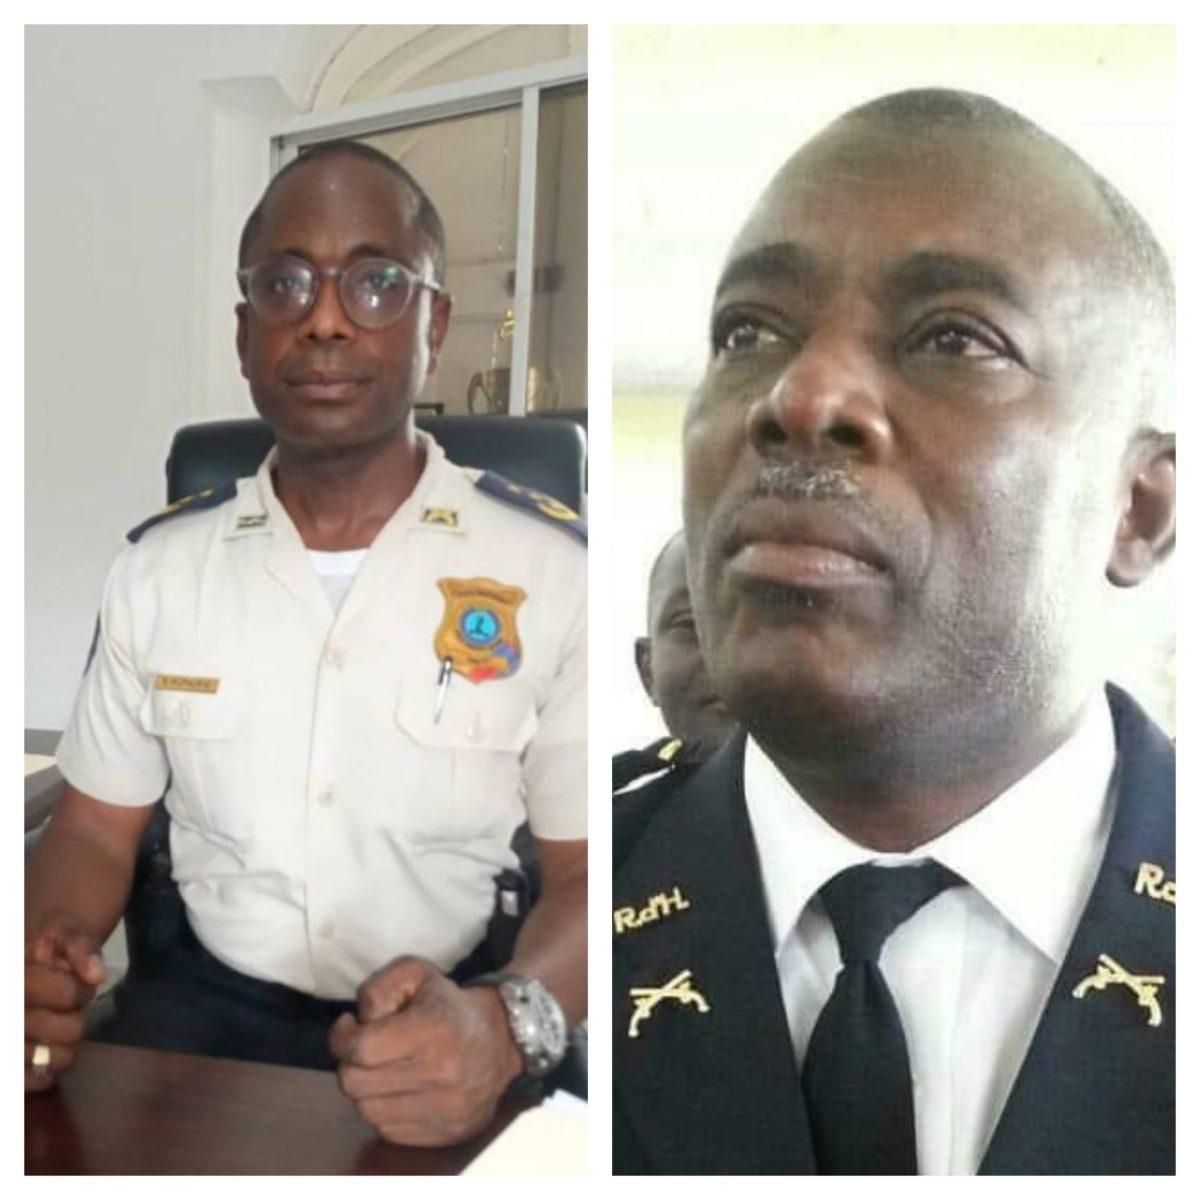 haiti police directors